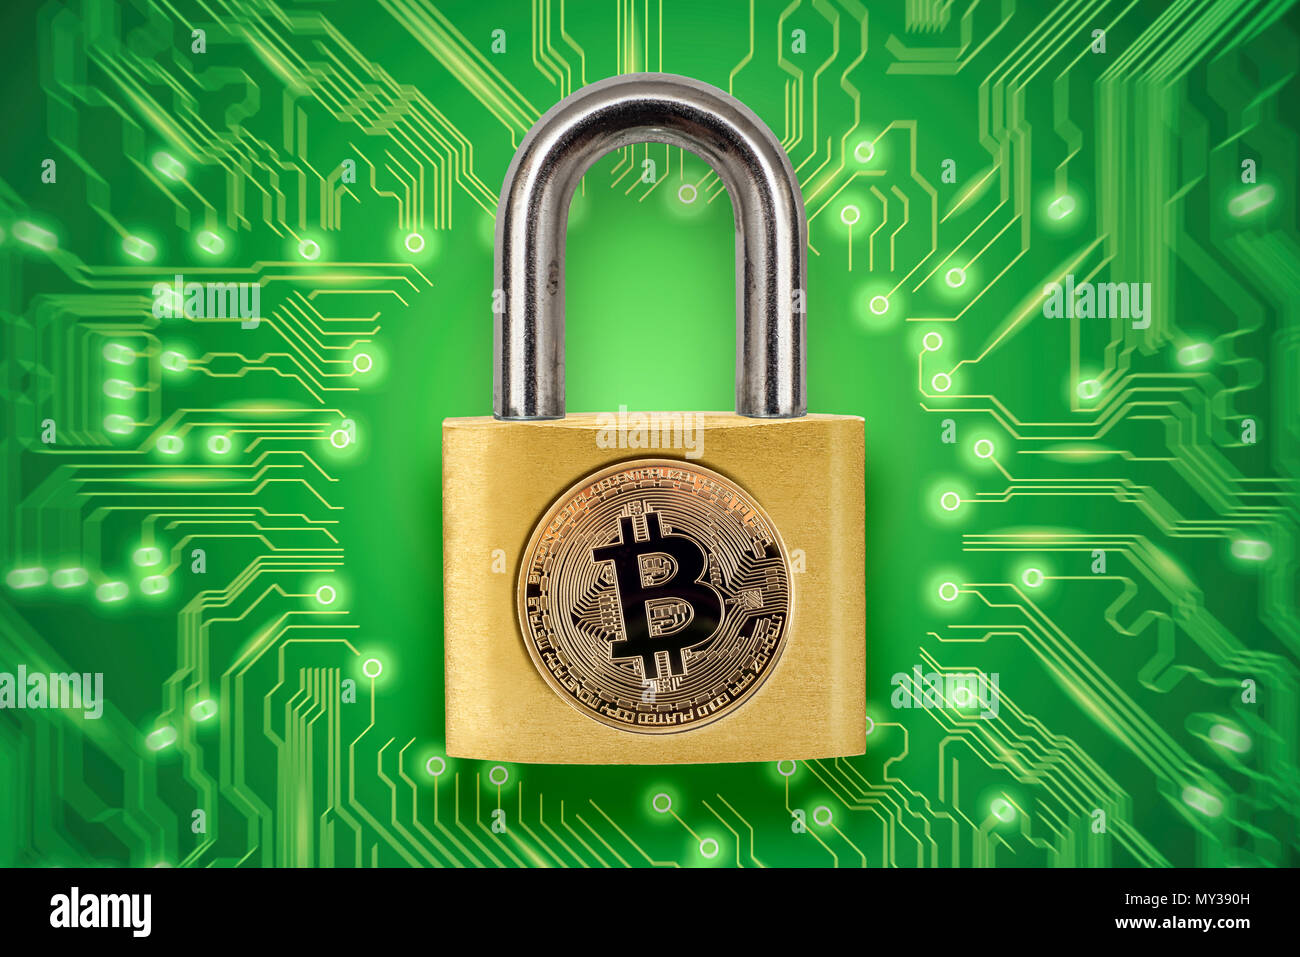 Candado roto con logotipo bitcoin. Imagen conceptual ilustrando crypto moneda hacking y robo. Imagen De Stock